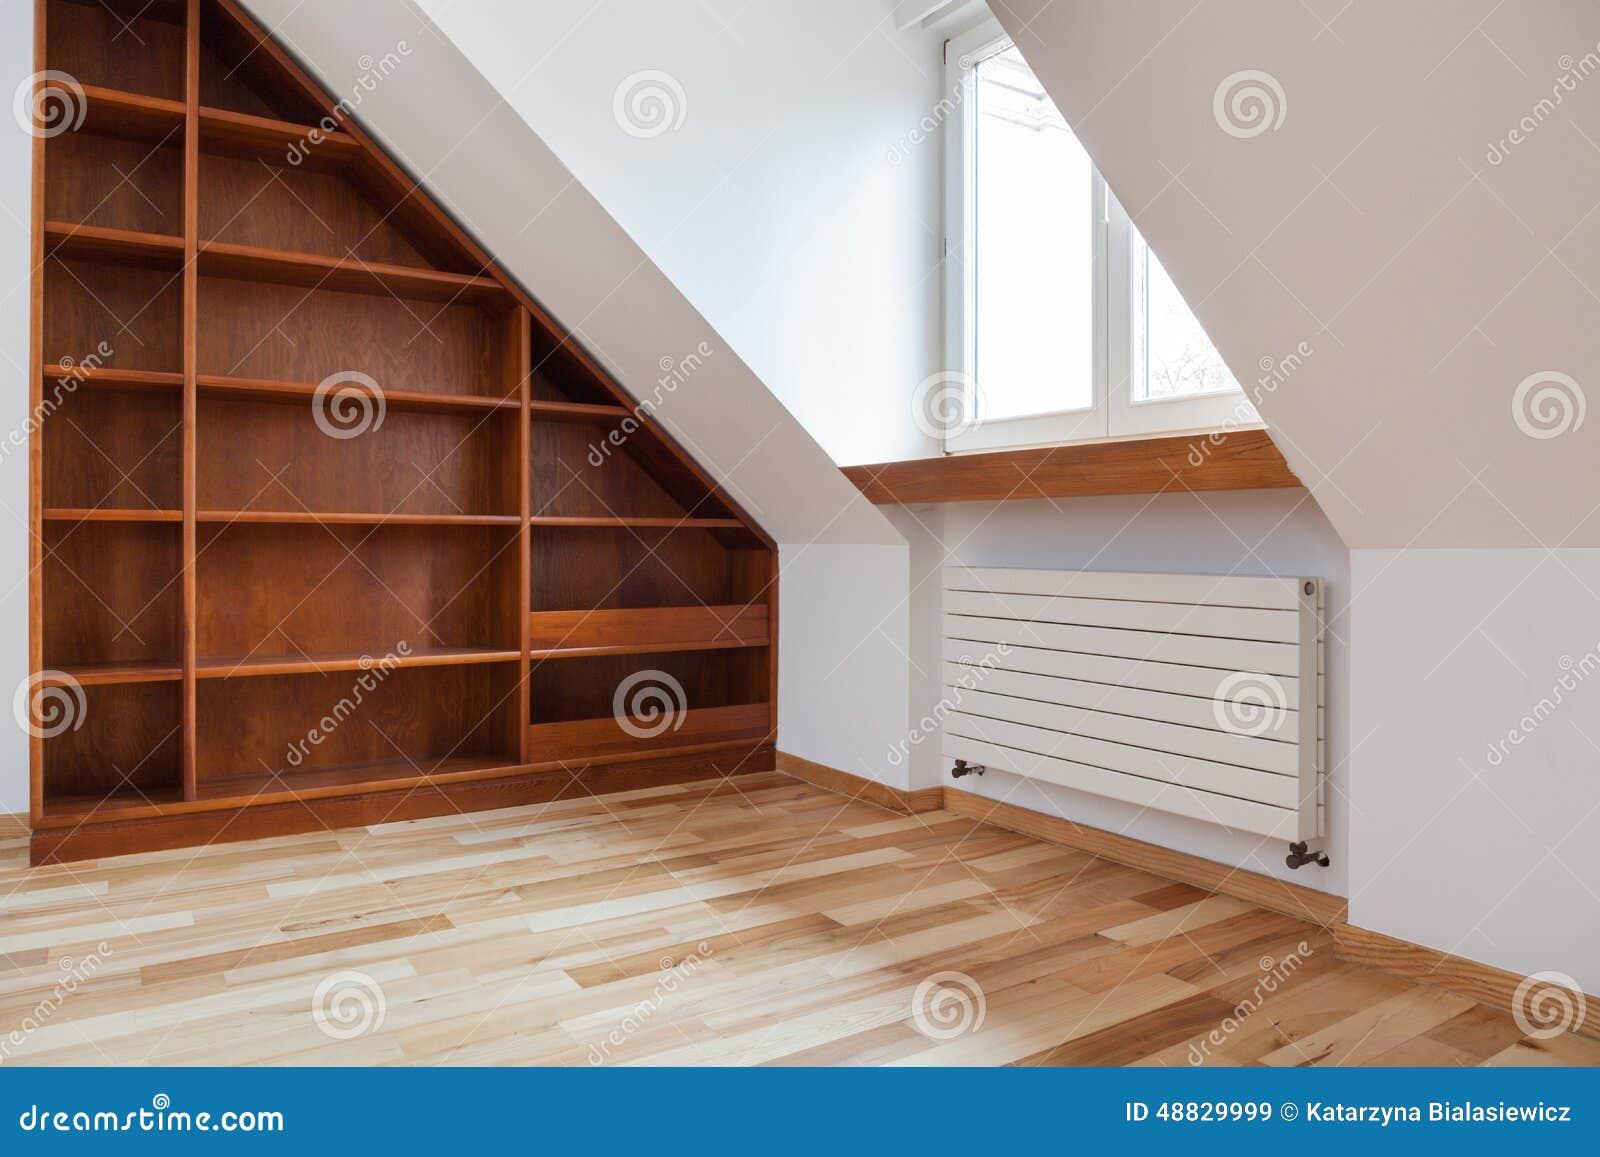 tag re vide dans le grenier image stock image du maison. Black Bedroom Furniture Sets. Home Design Ideas